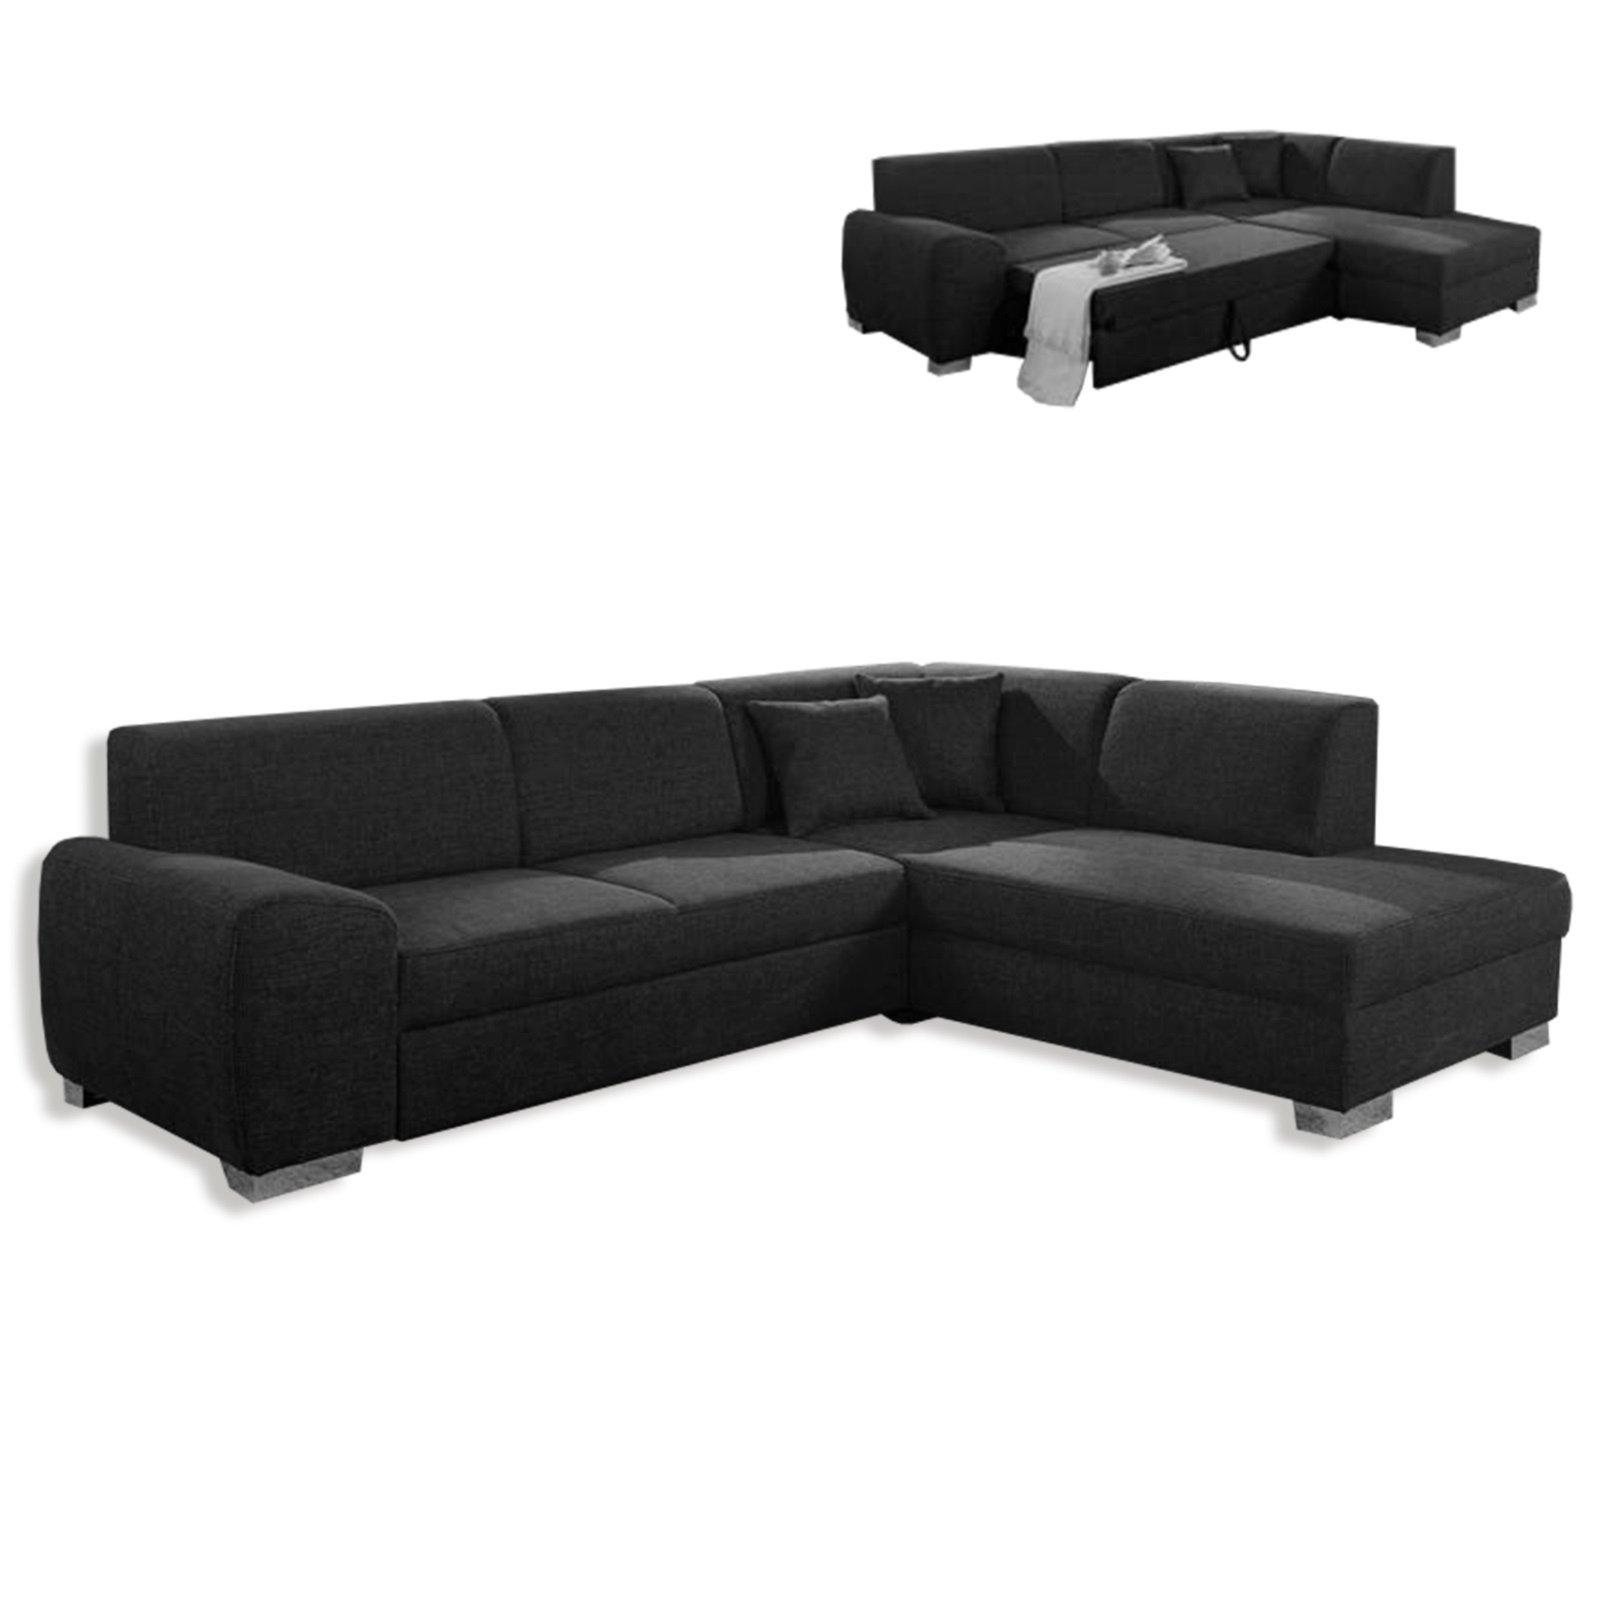 polsterecke schwarz liegefunktion ottomane rechts ecksofas l form sofas couches. Black Bedroom Furniture Sets. Home Design Ideas